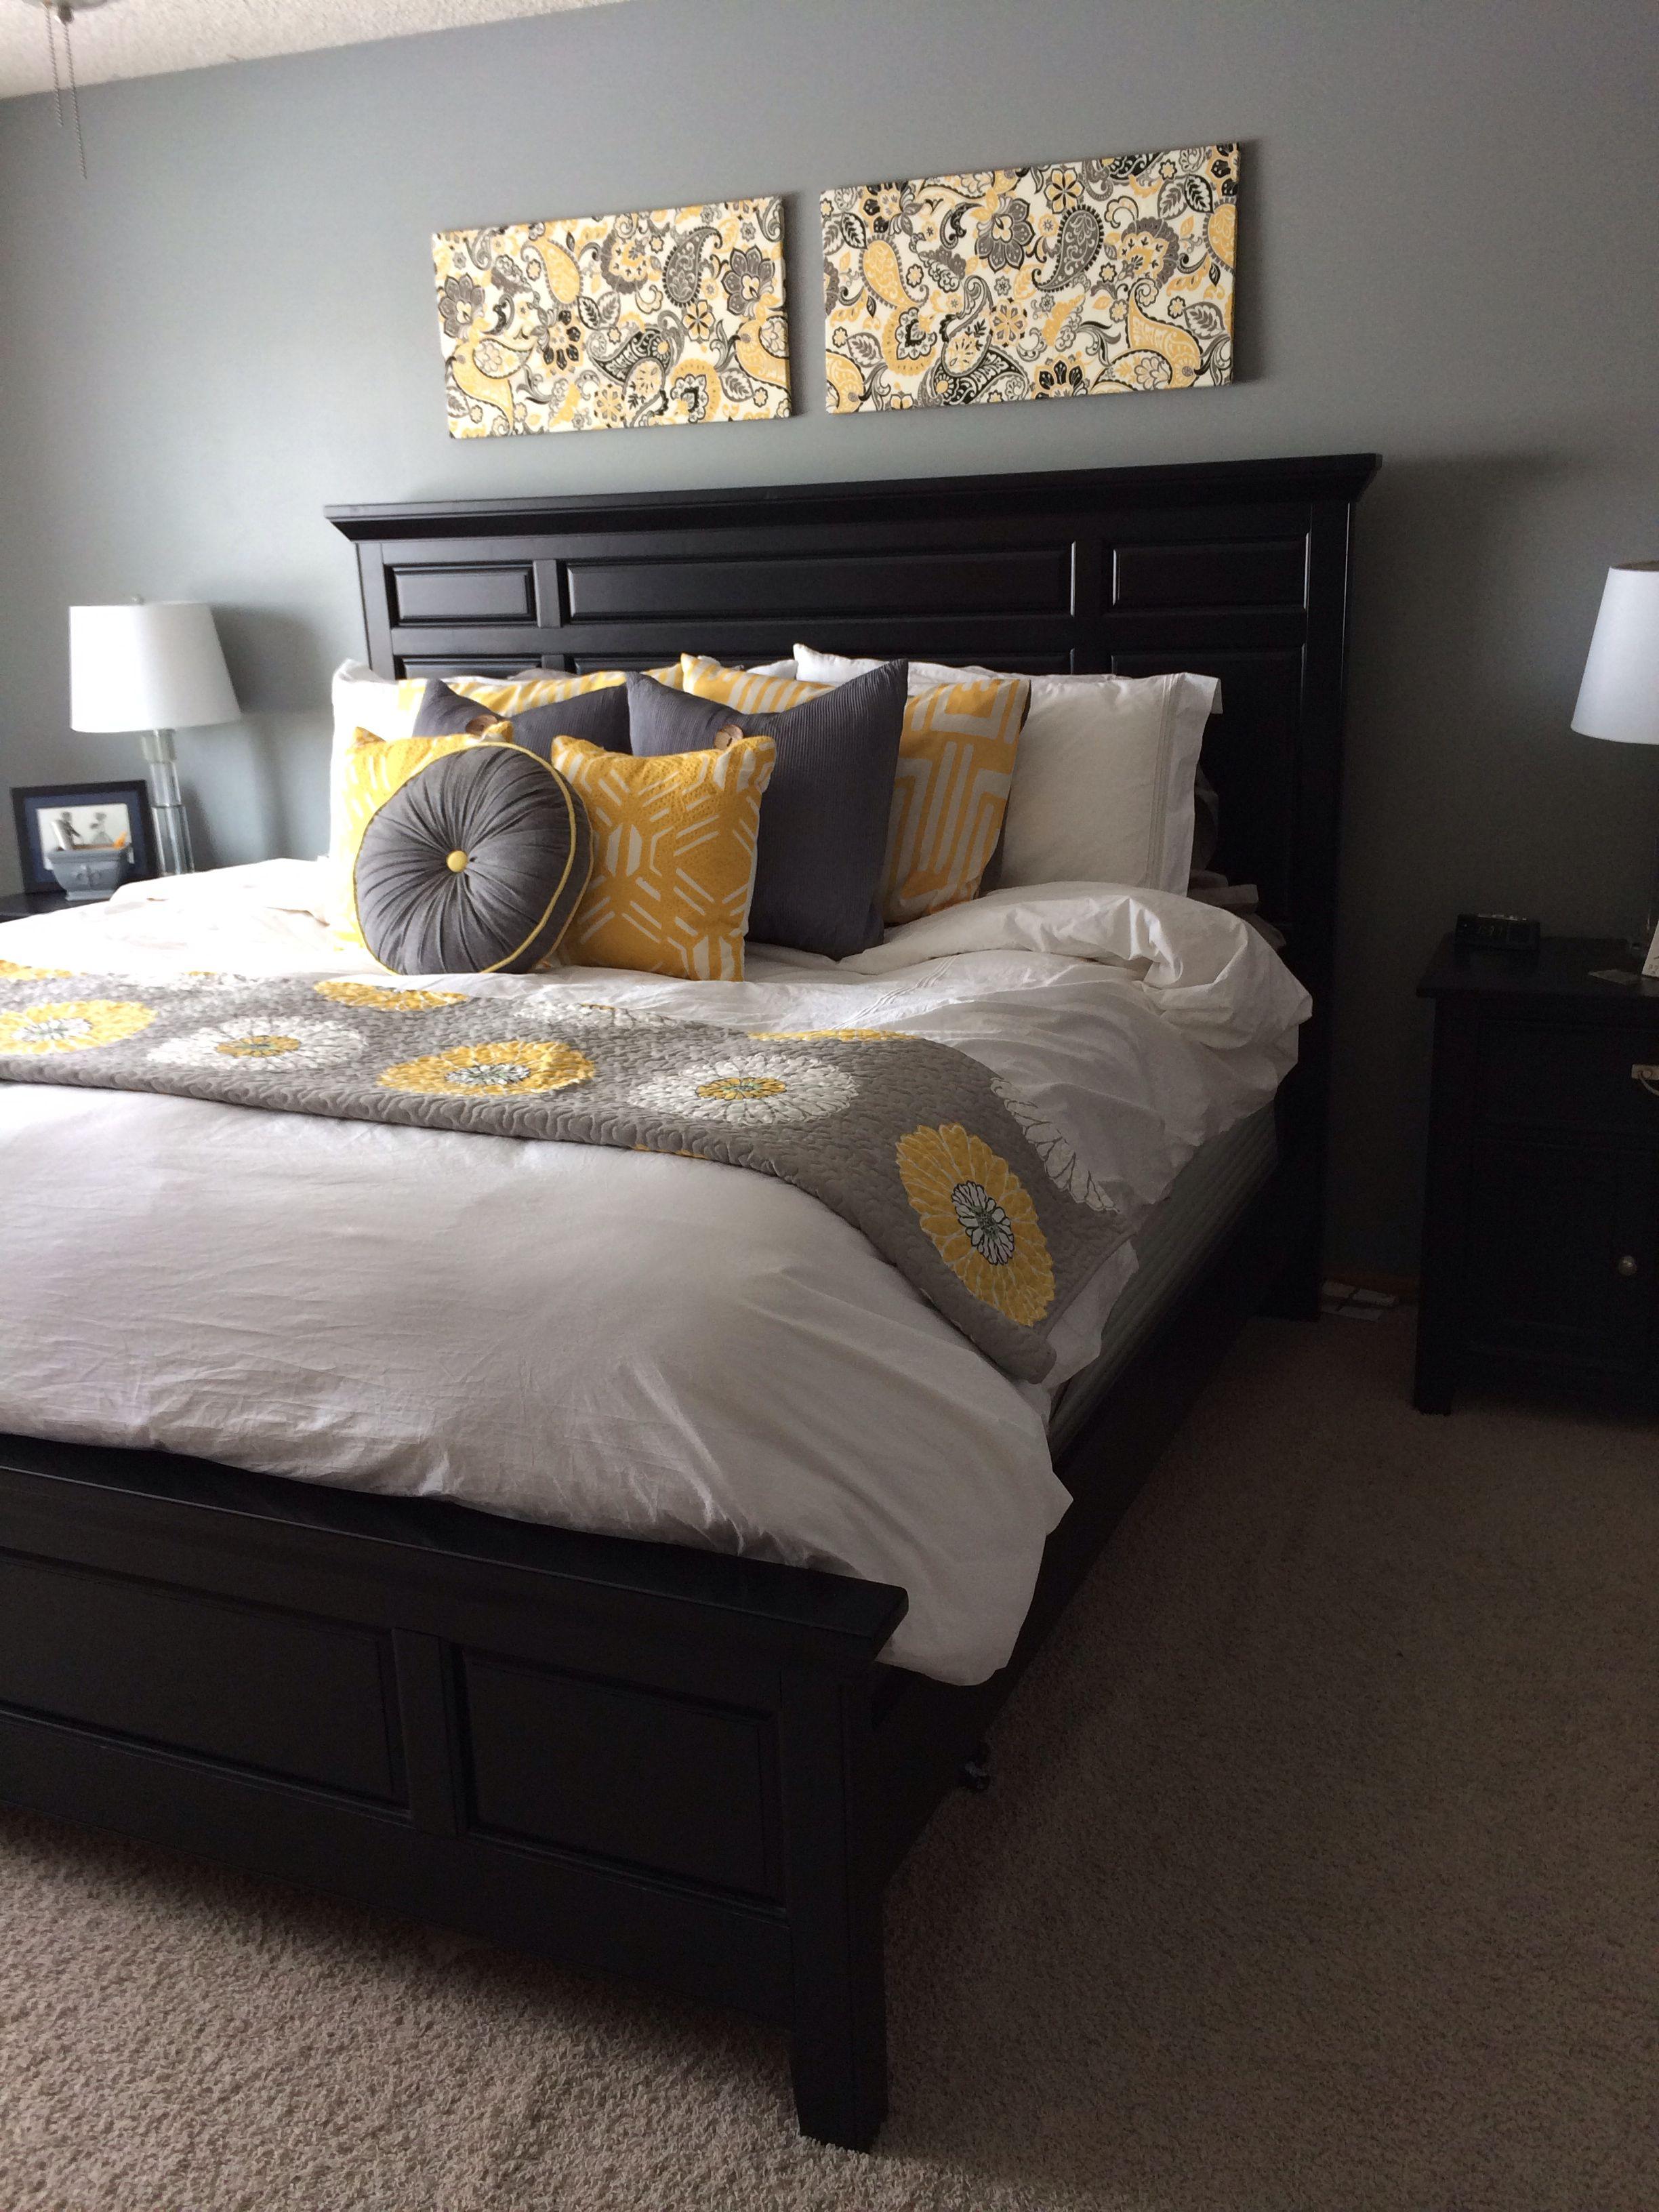 Bedroom Yellow And Gray Woman Bedroom Master Bedrooms Decor Yellow Bedroom